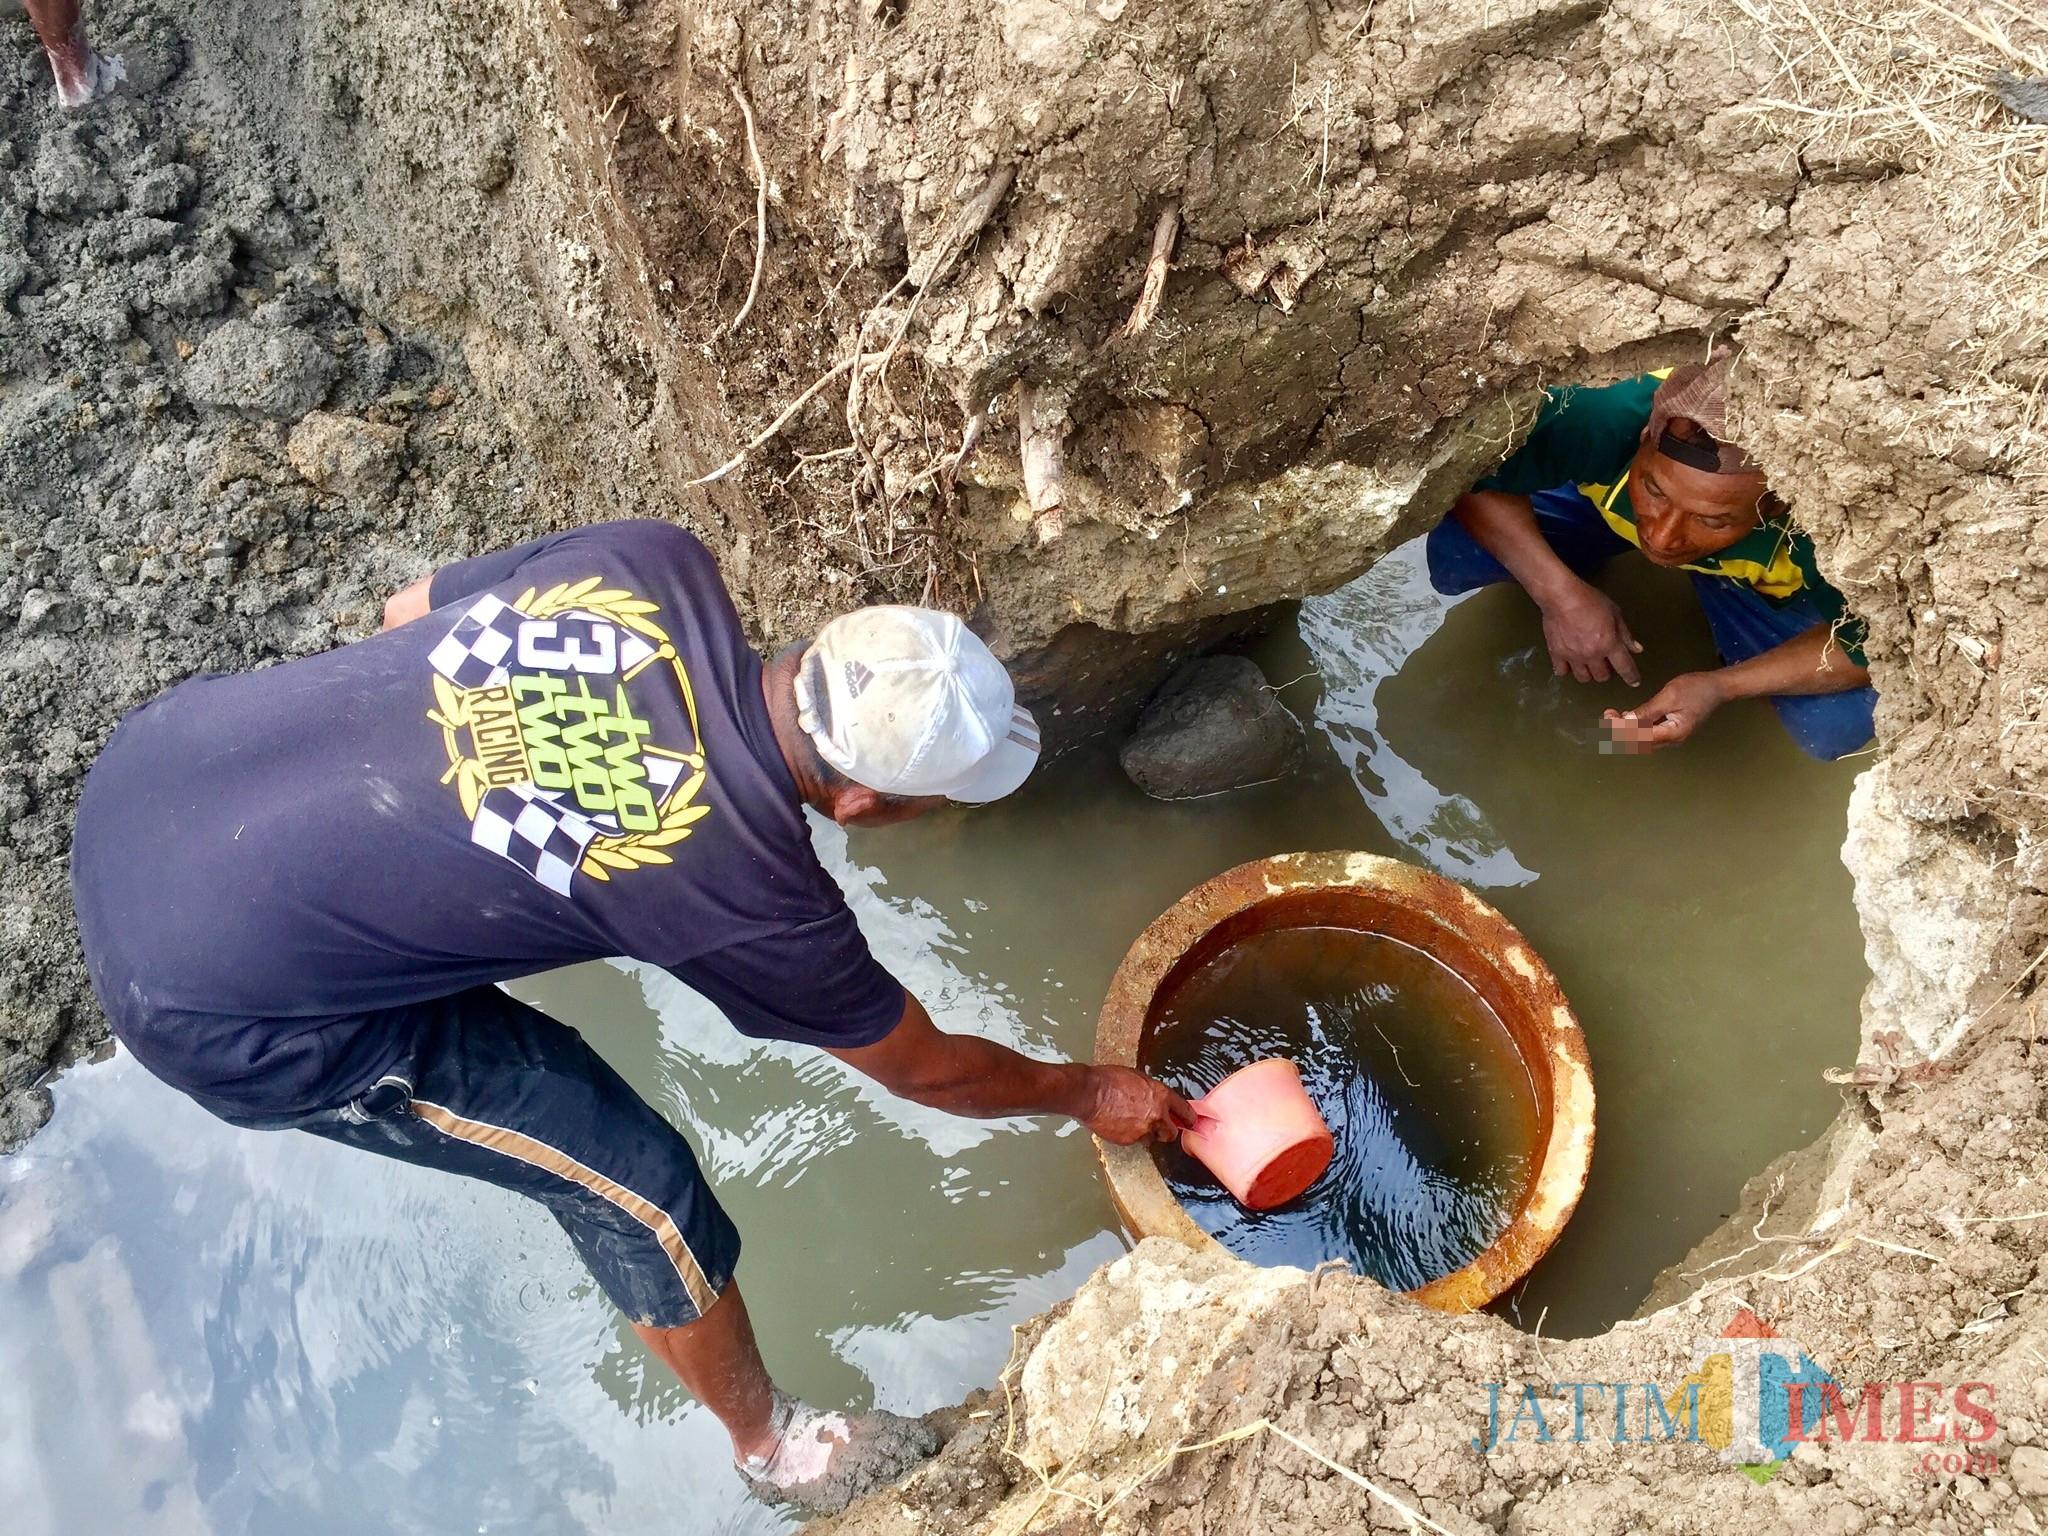 Warga saat menyiduk air sumber air hangat di Sumber Nyi Sindu Dusun Sumbersari, Desa Sumberejo, Kecamatan Batu, Kamis (11/7/2019). (Foto: Irsya Richa/MalangTIMES)